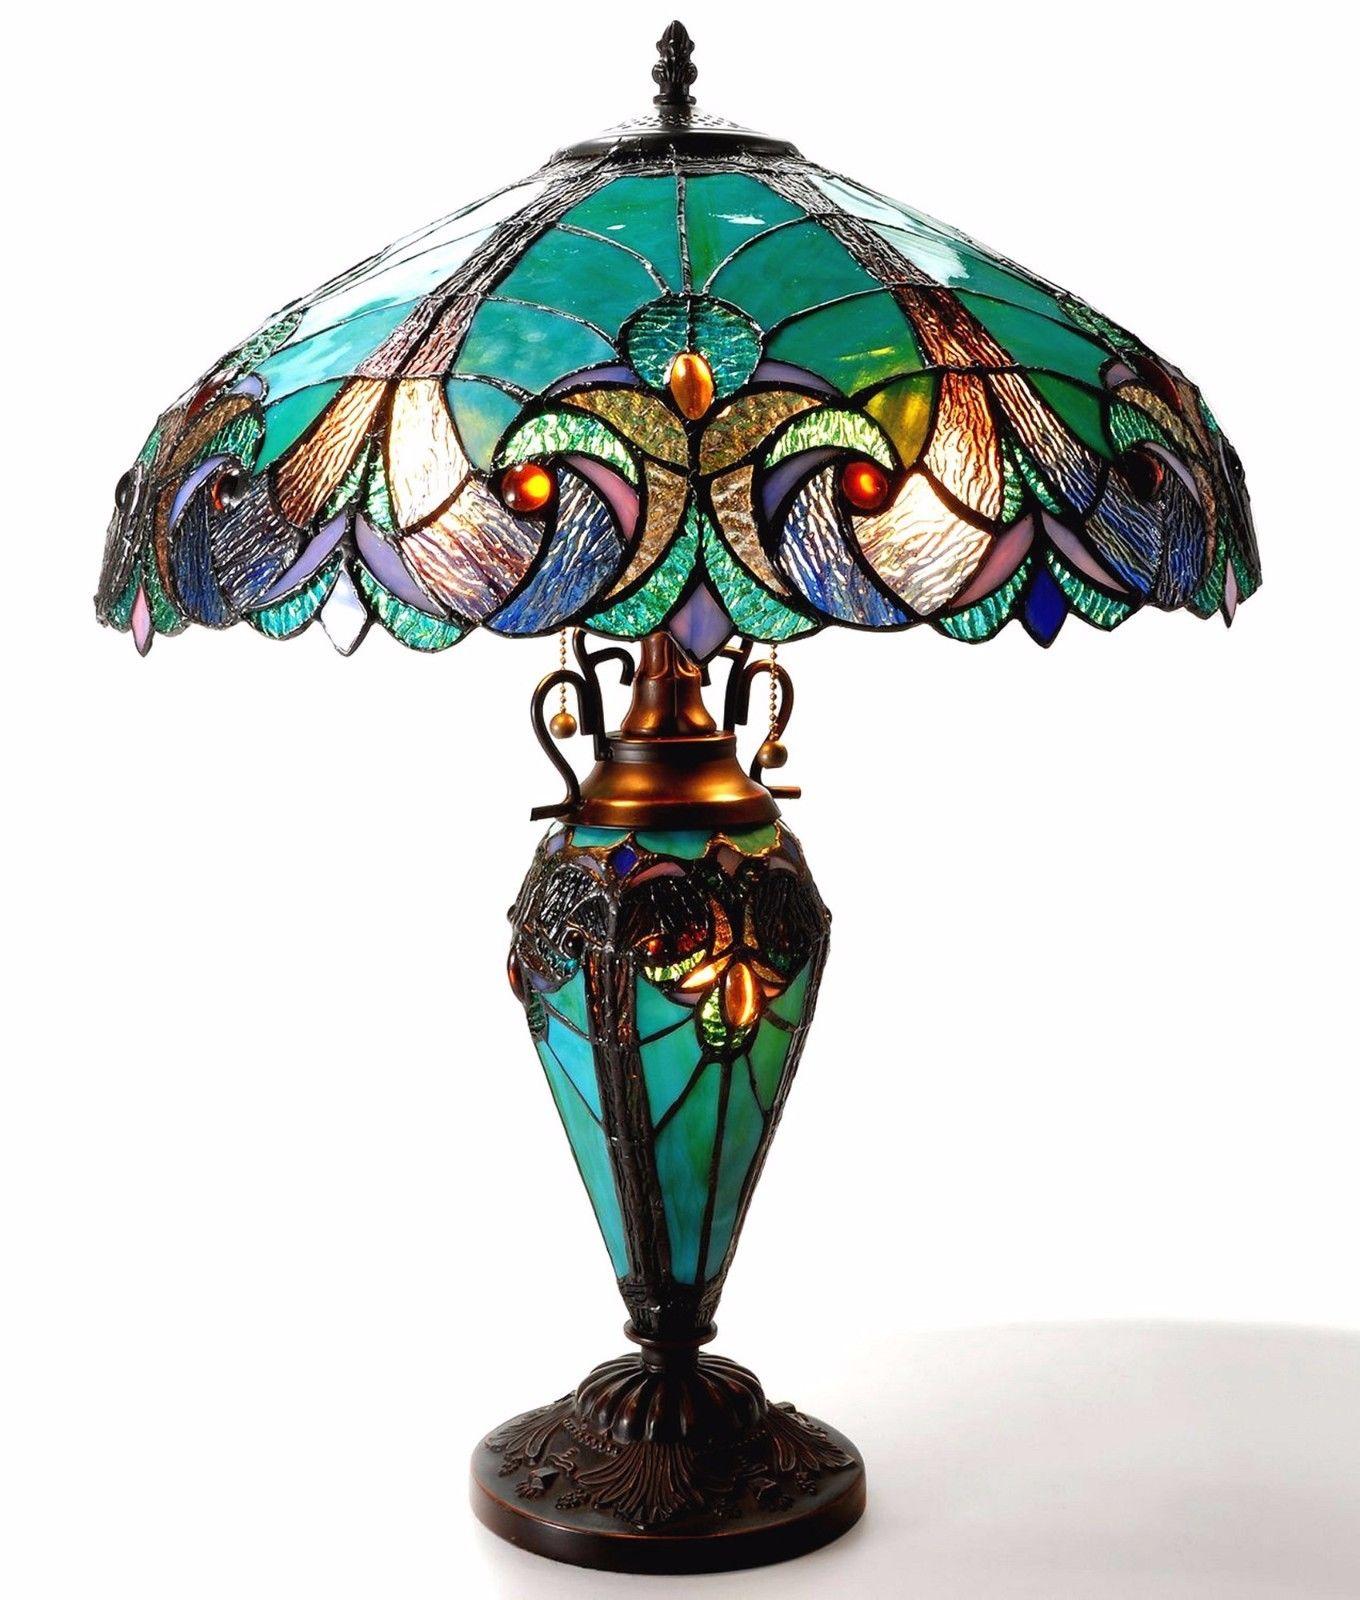 vintage-tiffany-lamps-photo-15